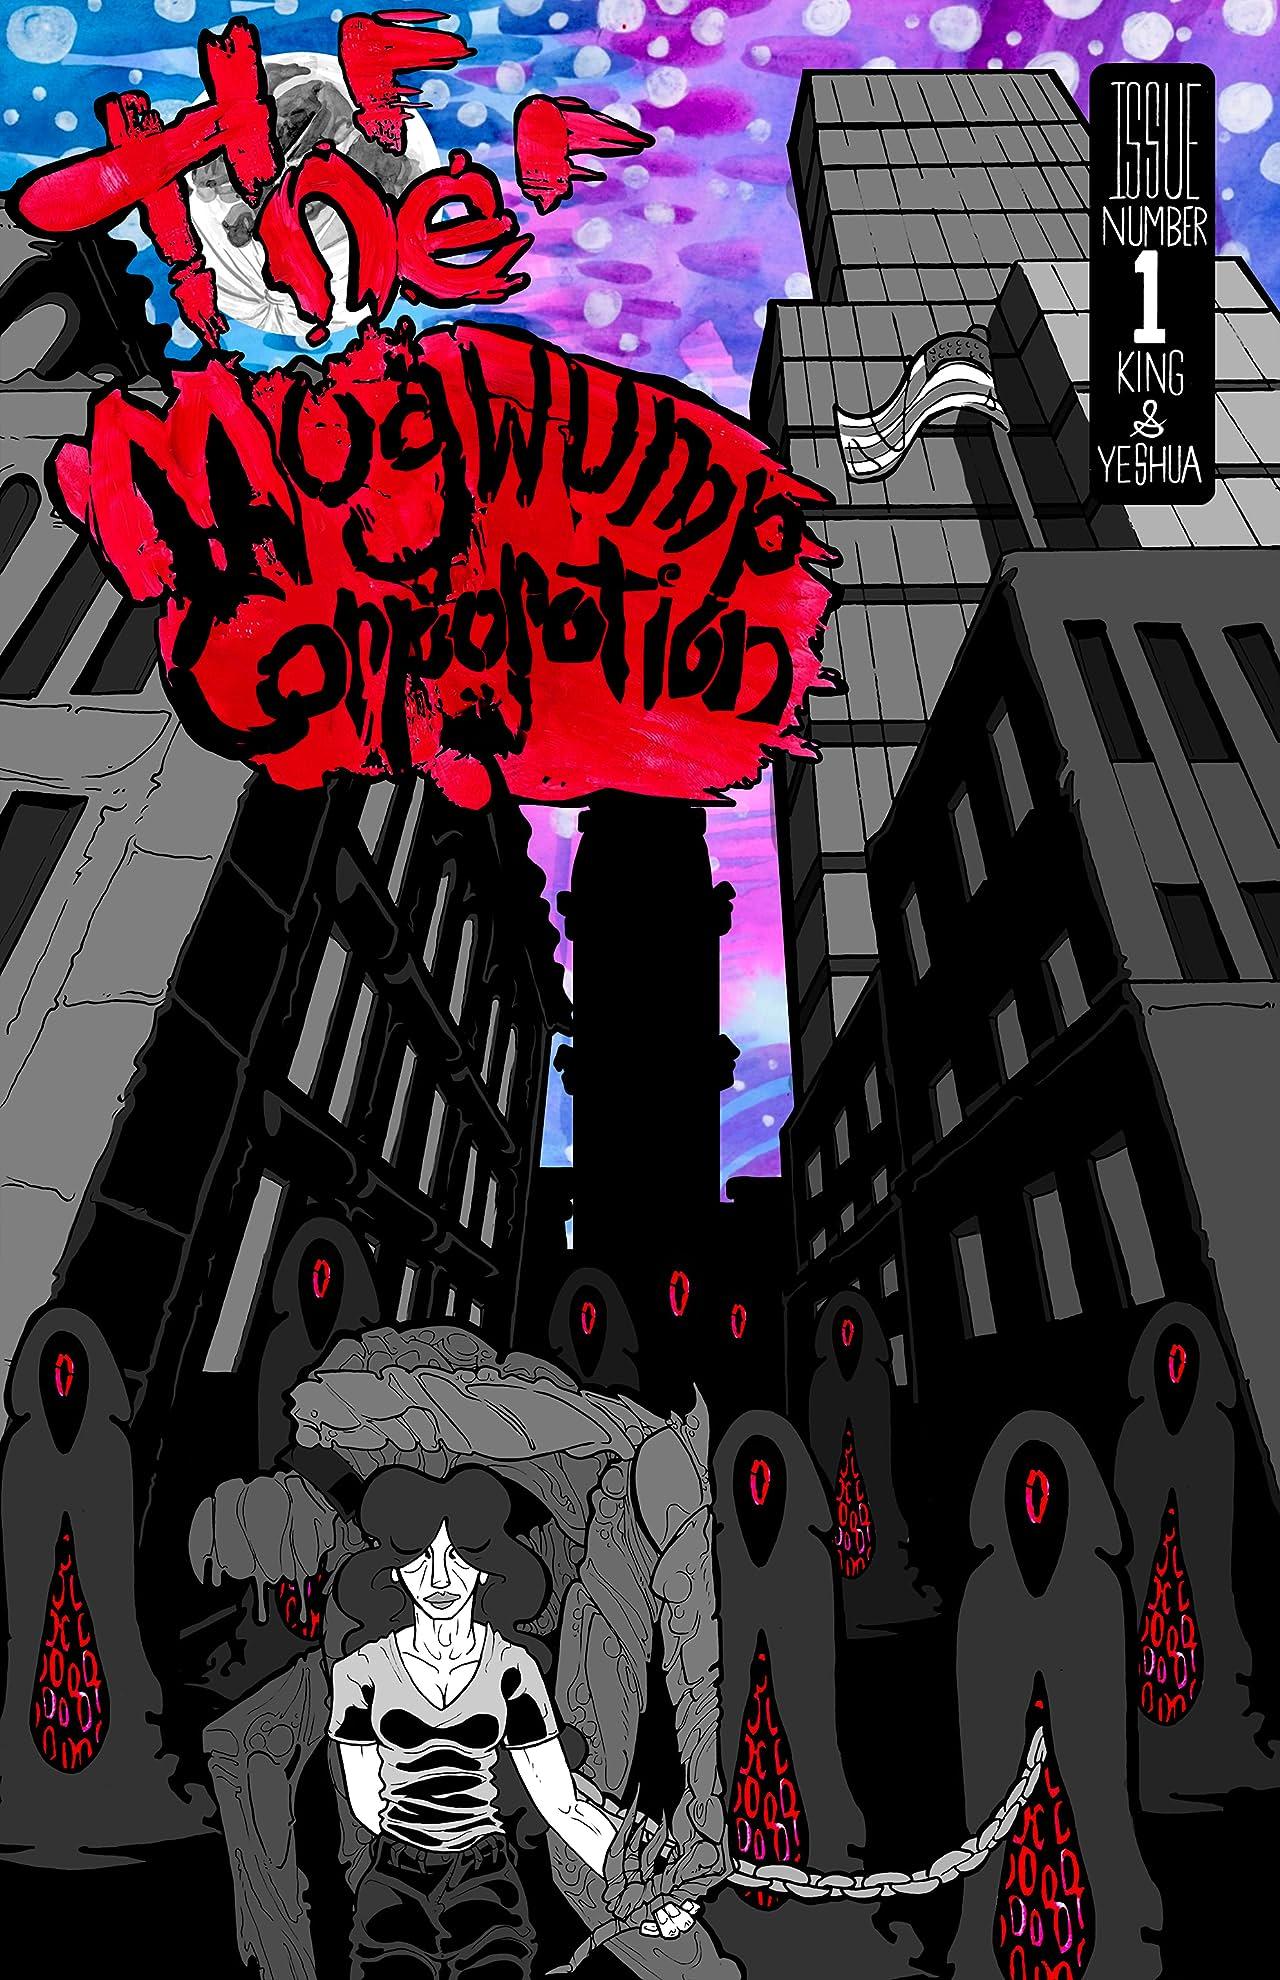 The Mugwump Corporation #1